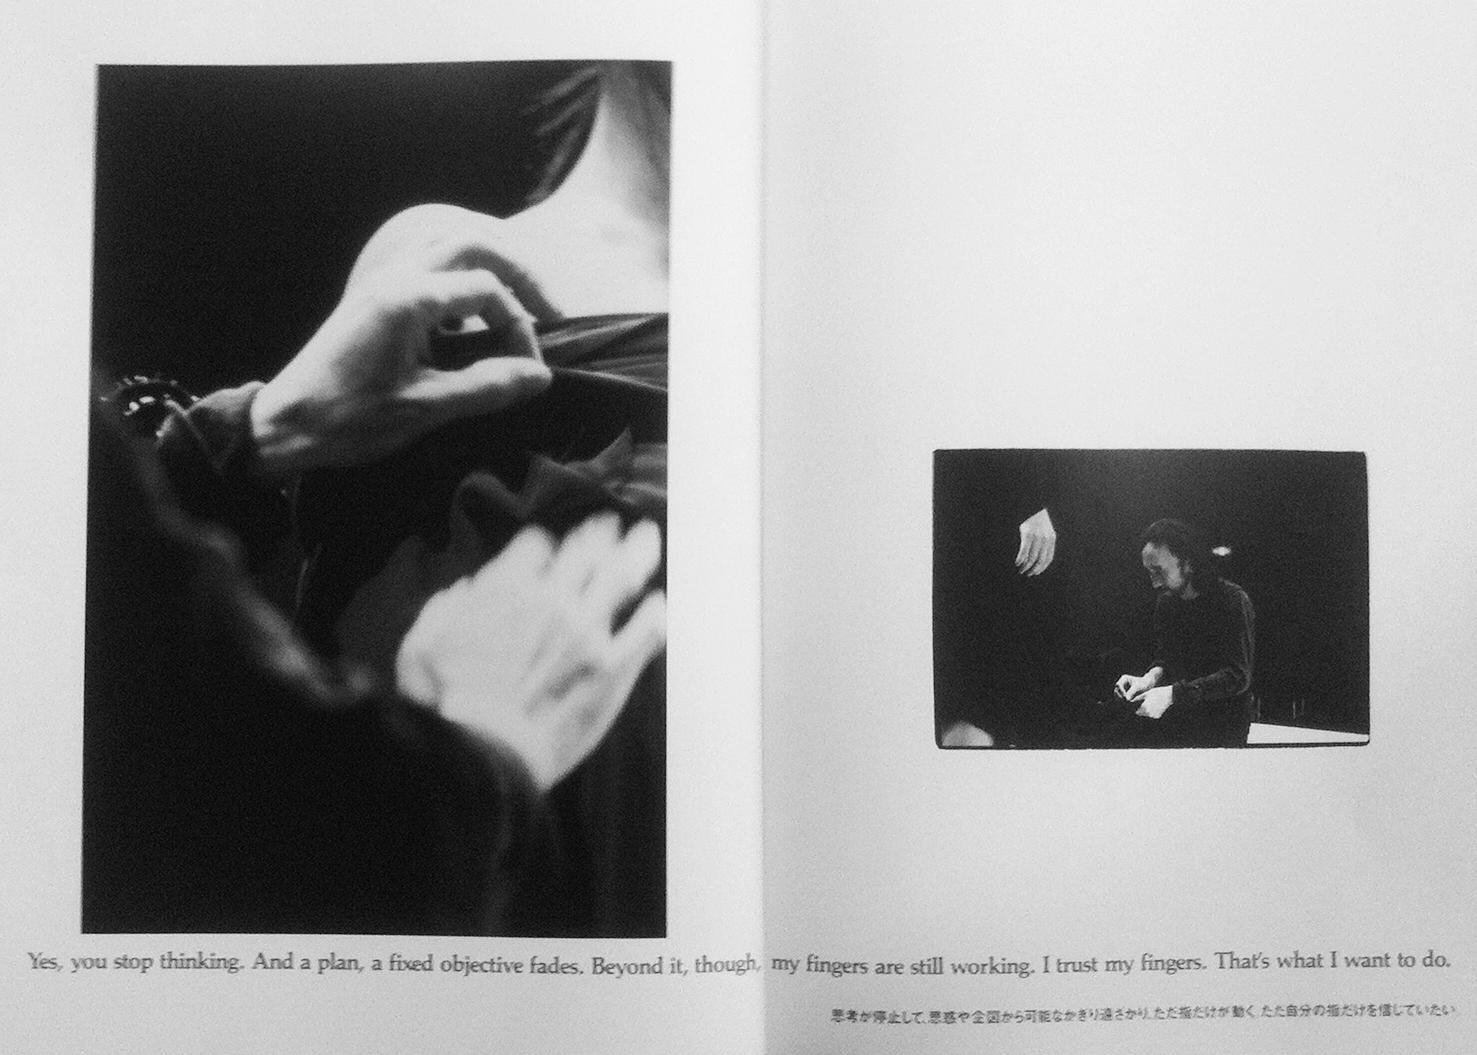 Yohji Yamamoto AW '91-'92 catalogue. Words, Yohji Yamamoto. Copyright, Yohji Yamamoto.Catalog is held in the Fashion Museum of the Province of Antwerp (MoMu) Archive. Images courtesy MoMu.